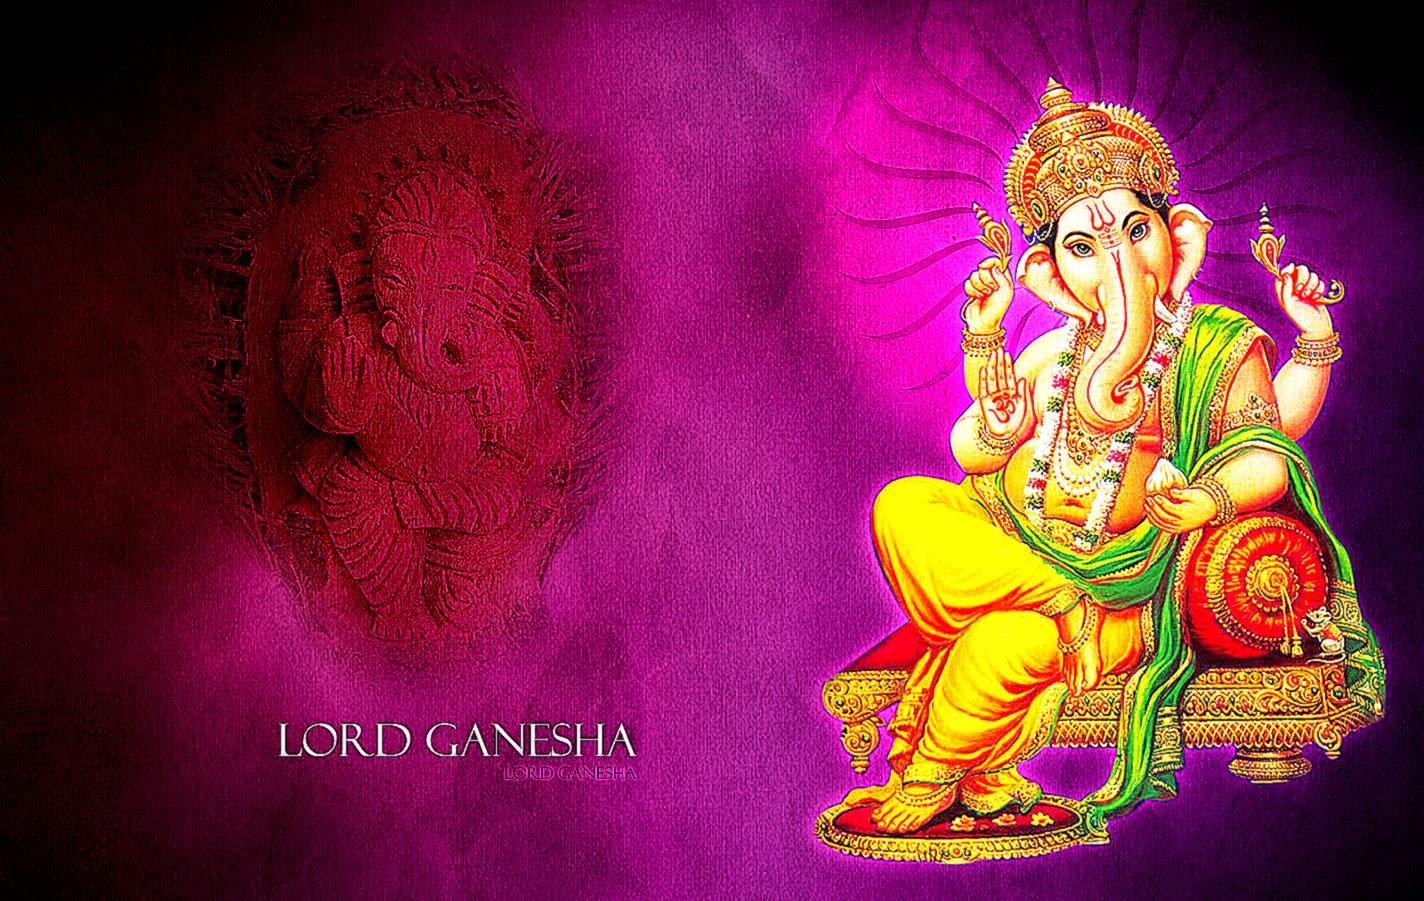 Top Wallpaper Lord Desktop - lord-ganesha-desktop-wallpapers-7718-wallpaper-res-1024x768  Trends_616896.jpg